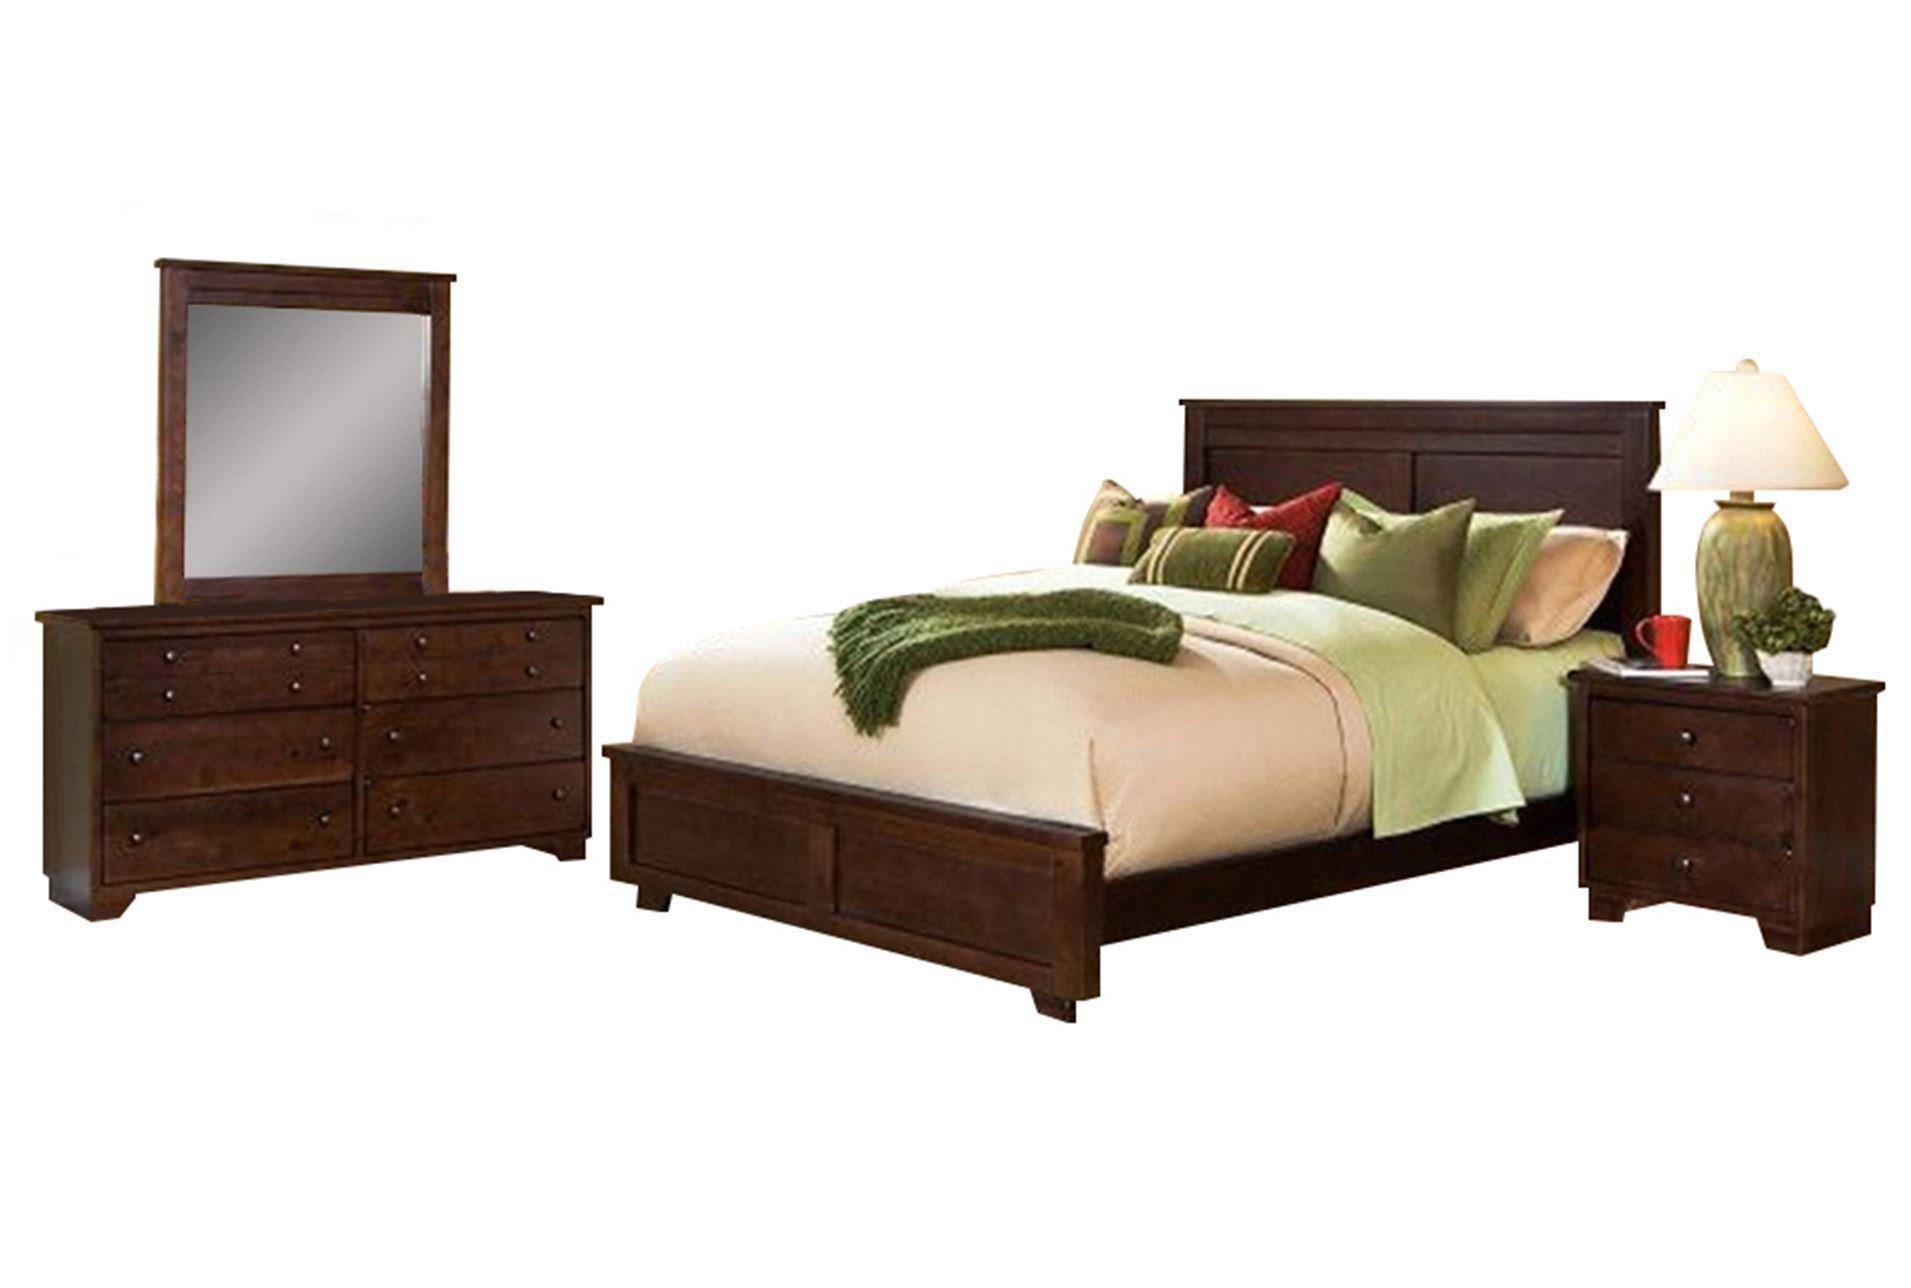 Living Spaces Bed : Marco Queen 4 Piece Bedroom Set - Living Spaces